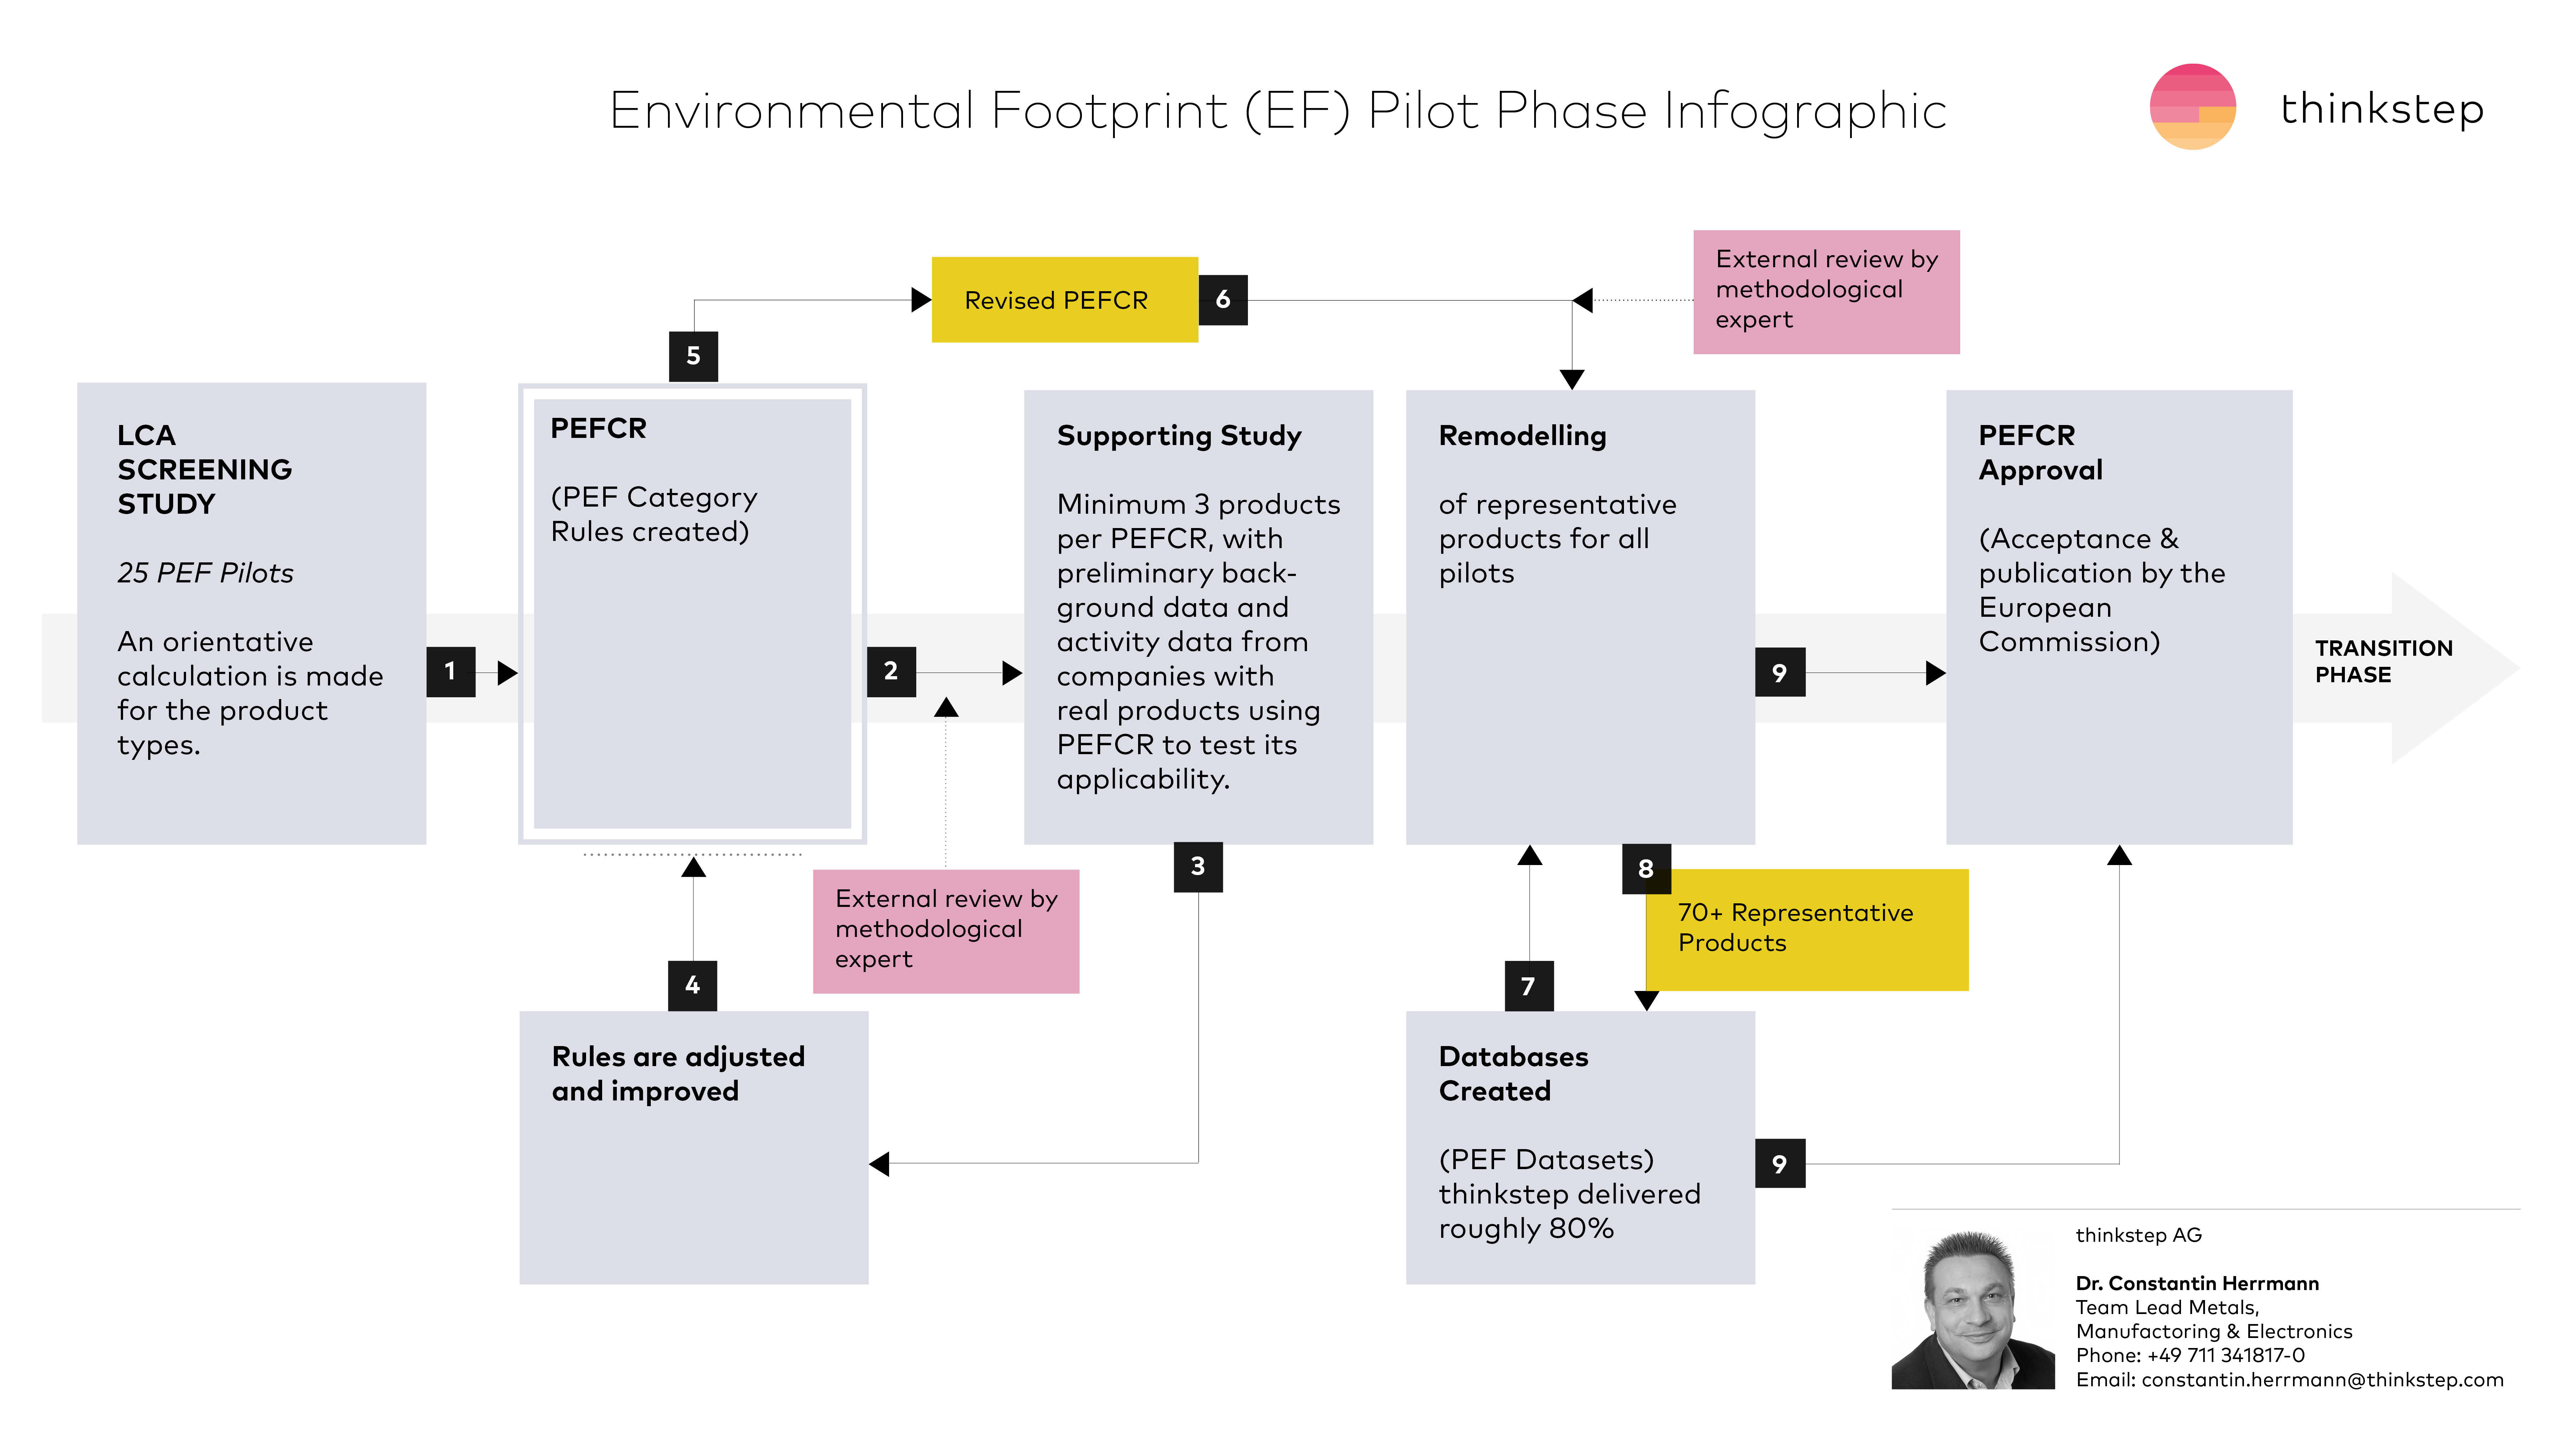 PEF pilot phase infographic